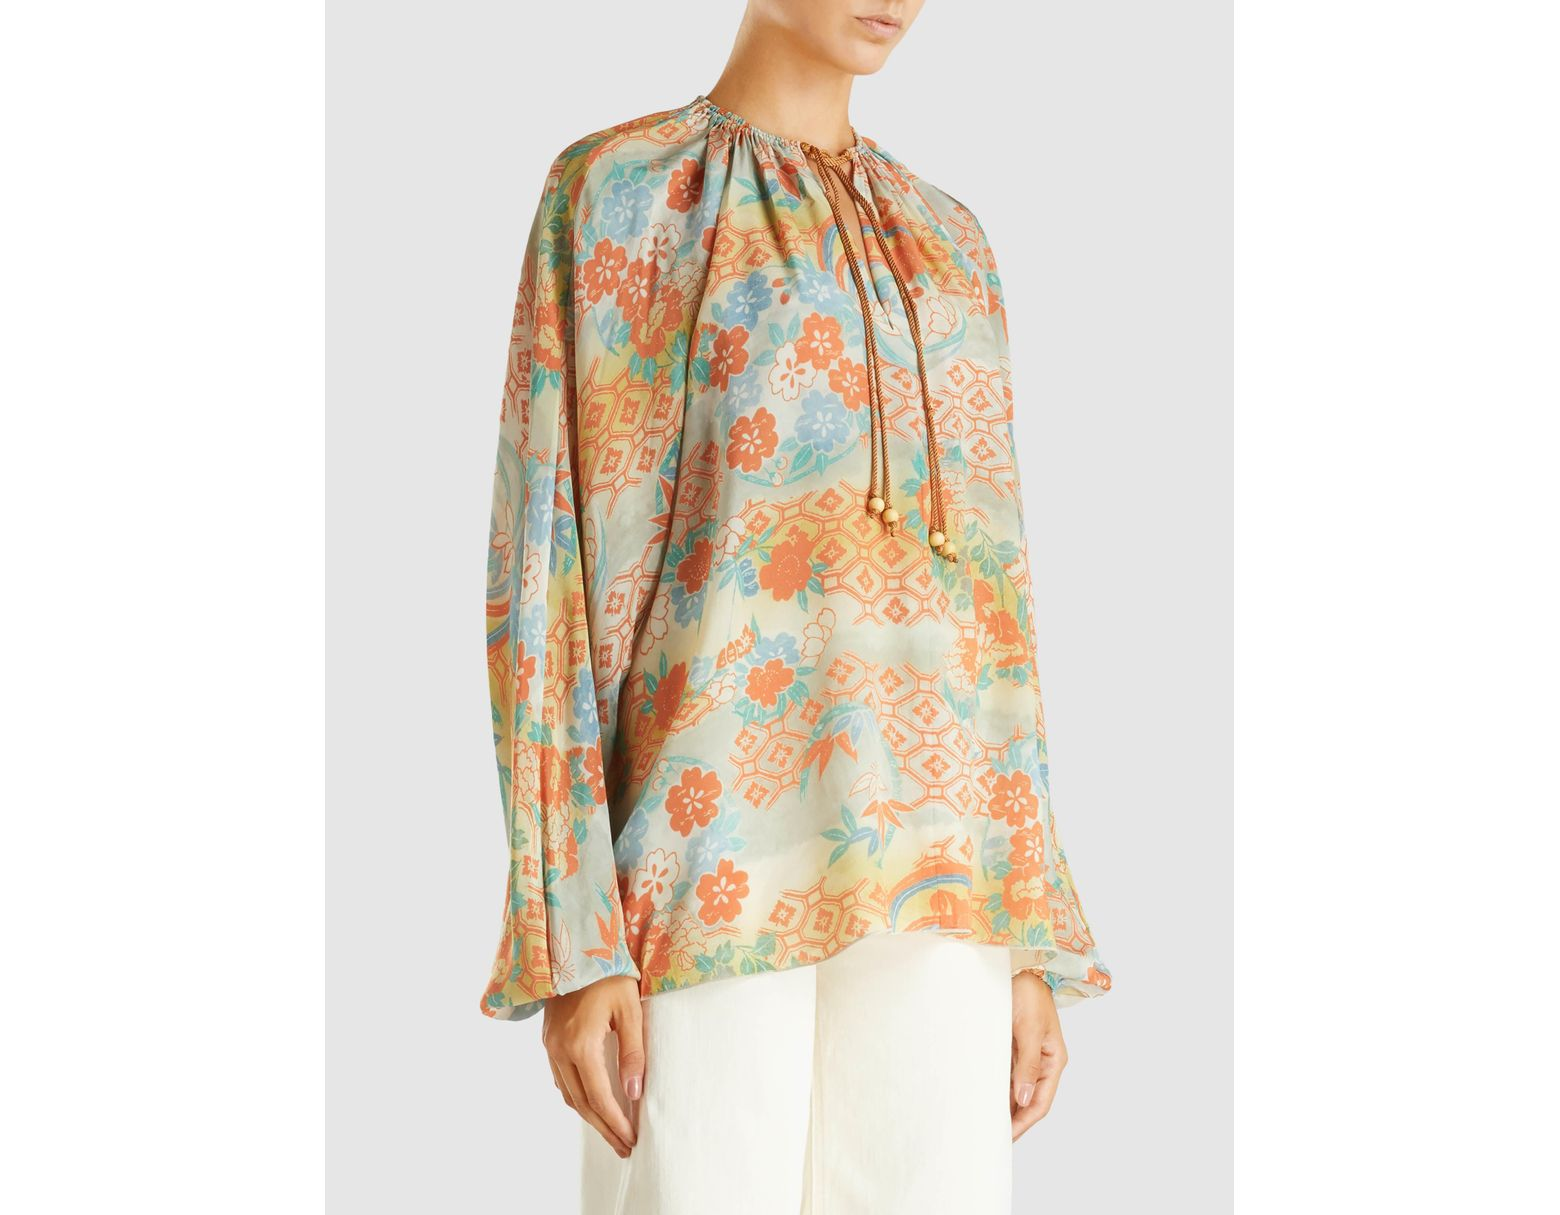 d1f70ba1de4f48 Elizabeth and James Chance Printed Long Sleeve Silk Blouse - Lyst